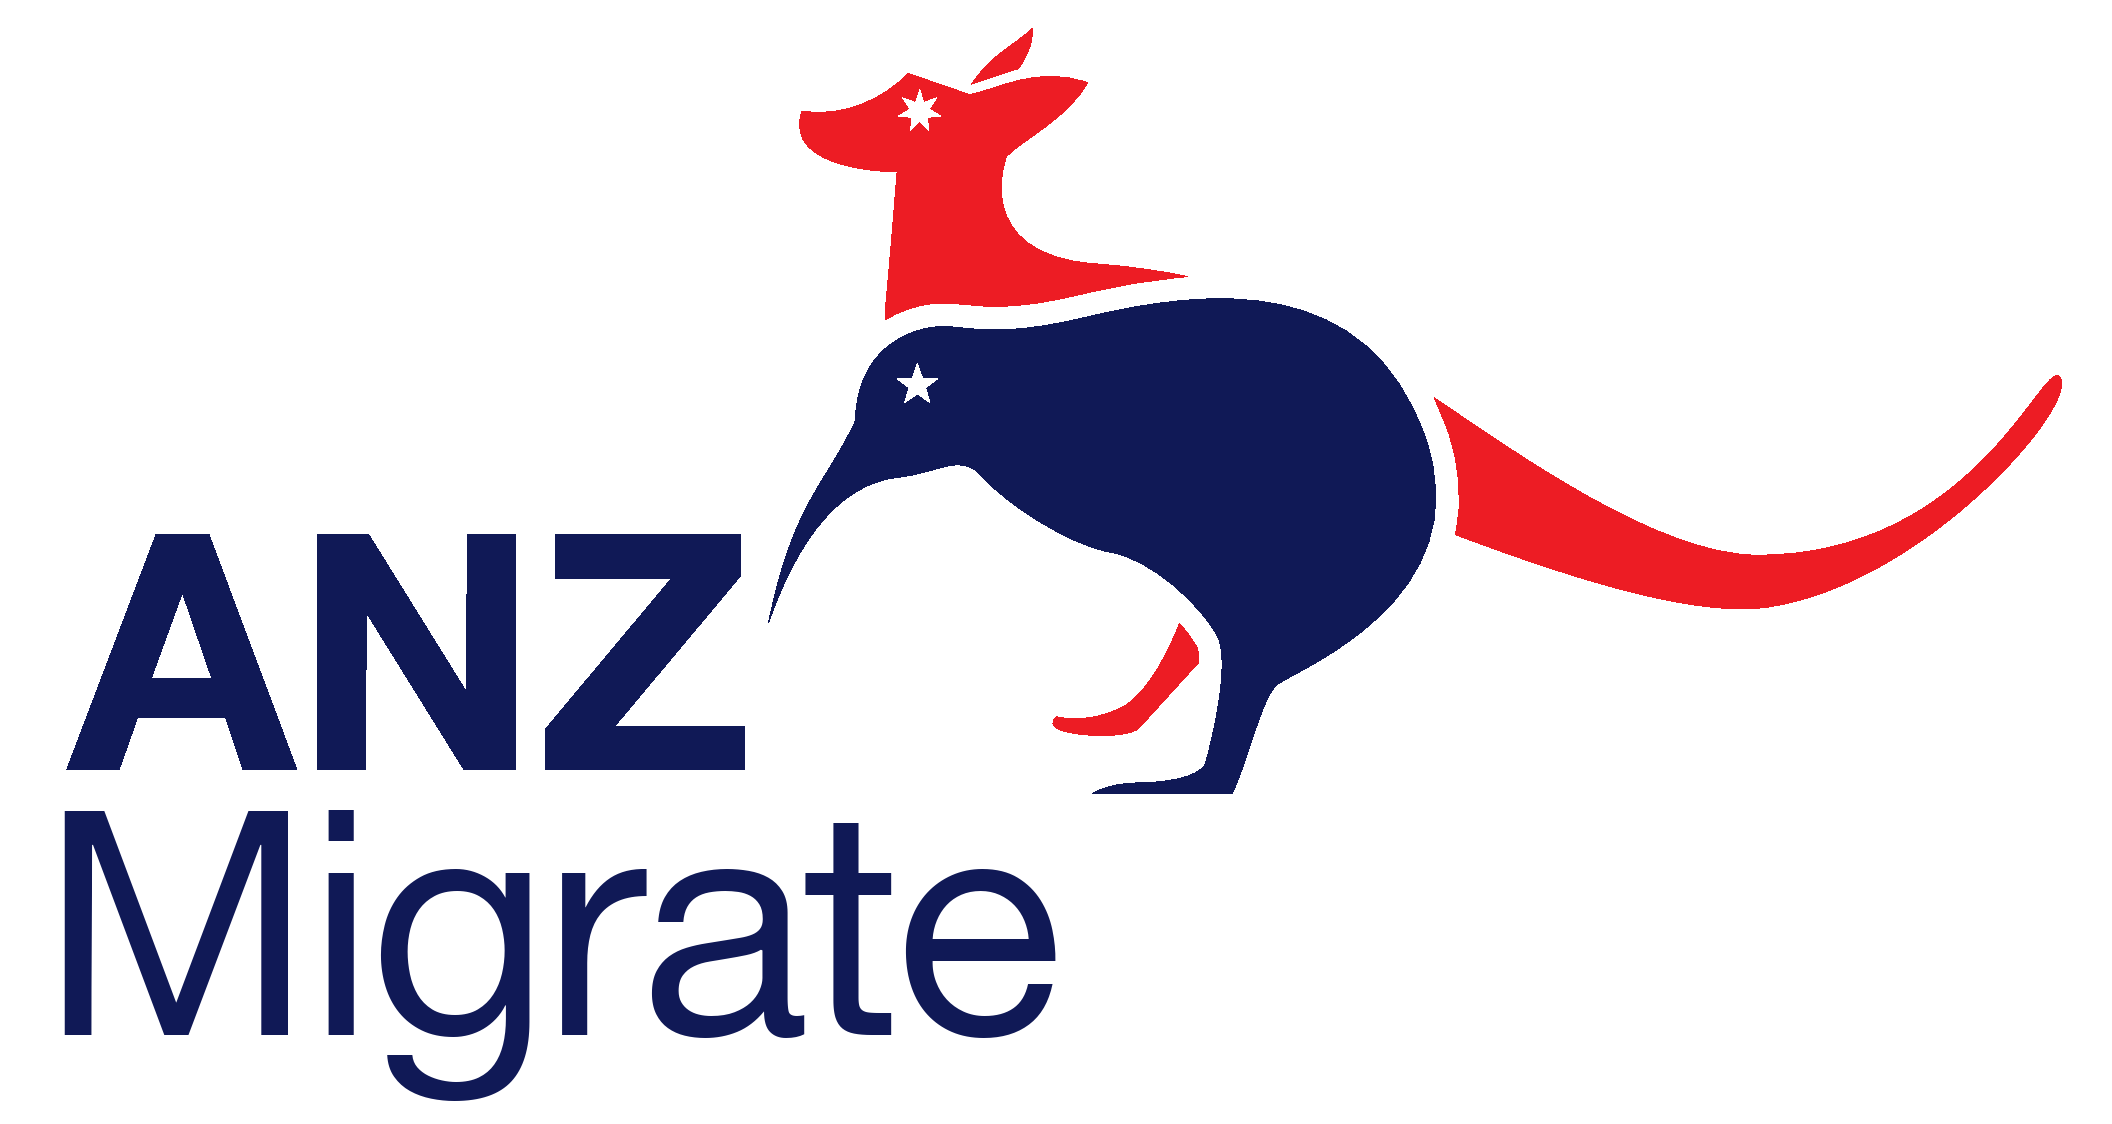 ANZ Migrate logo